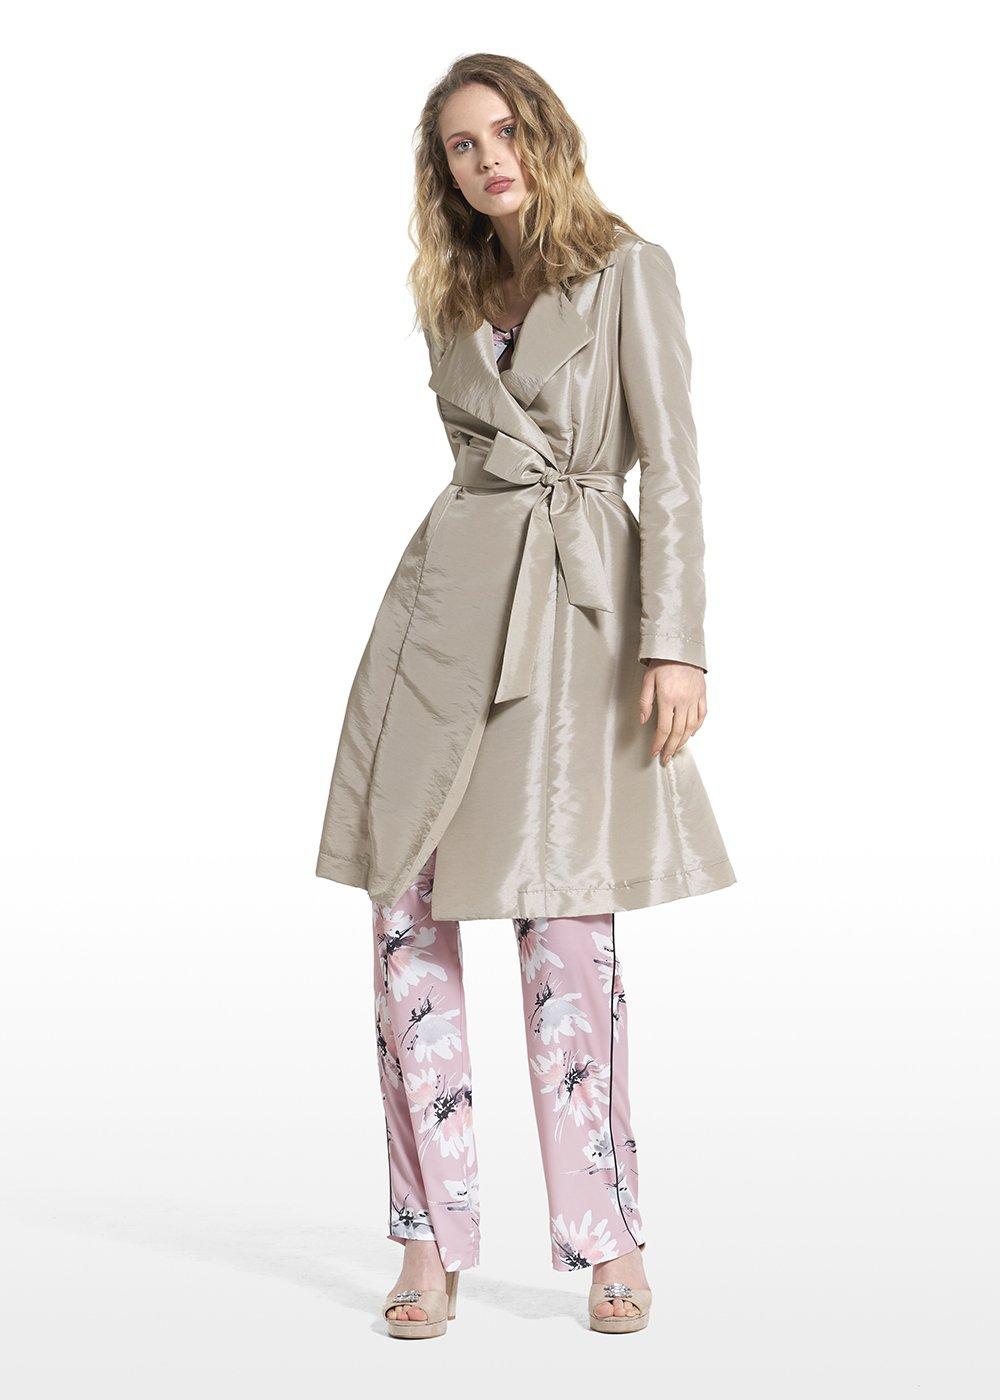 Thomas trench coat with waist belt - Light Beige - Woman